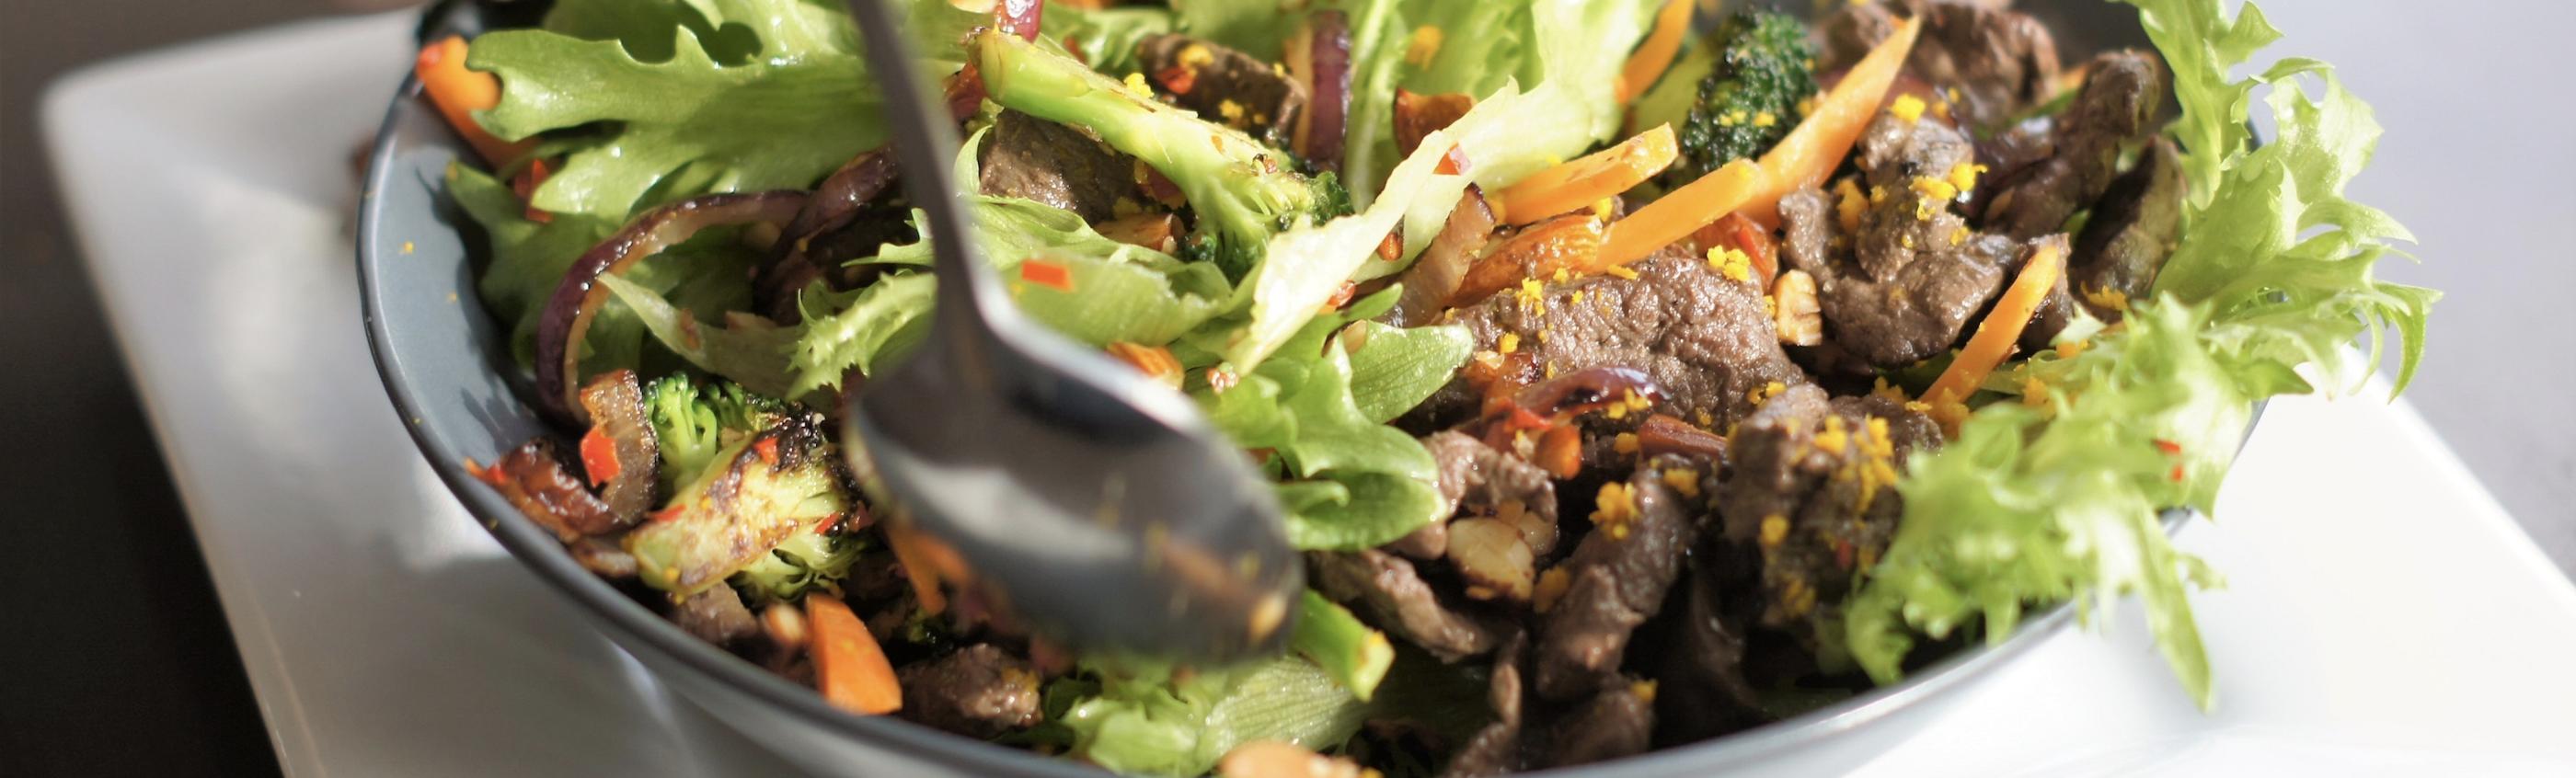 Varm salat med hvalskav